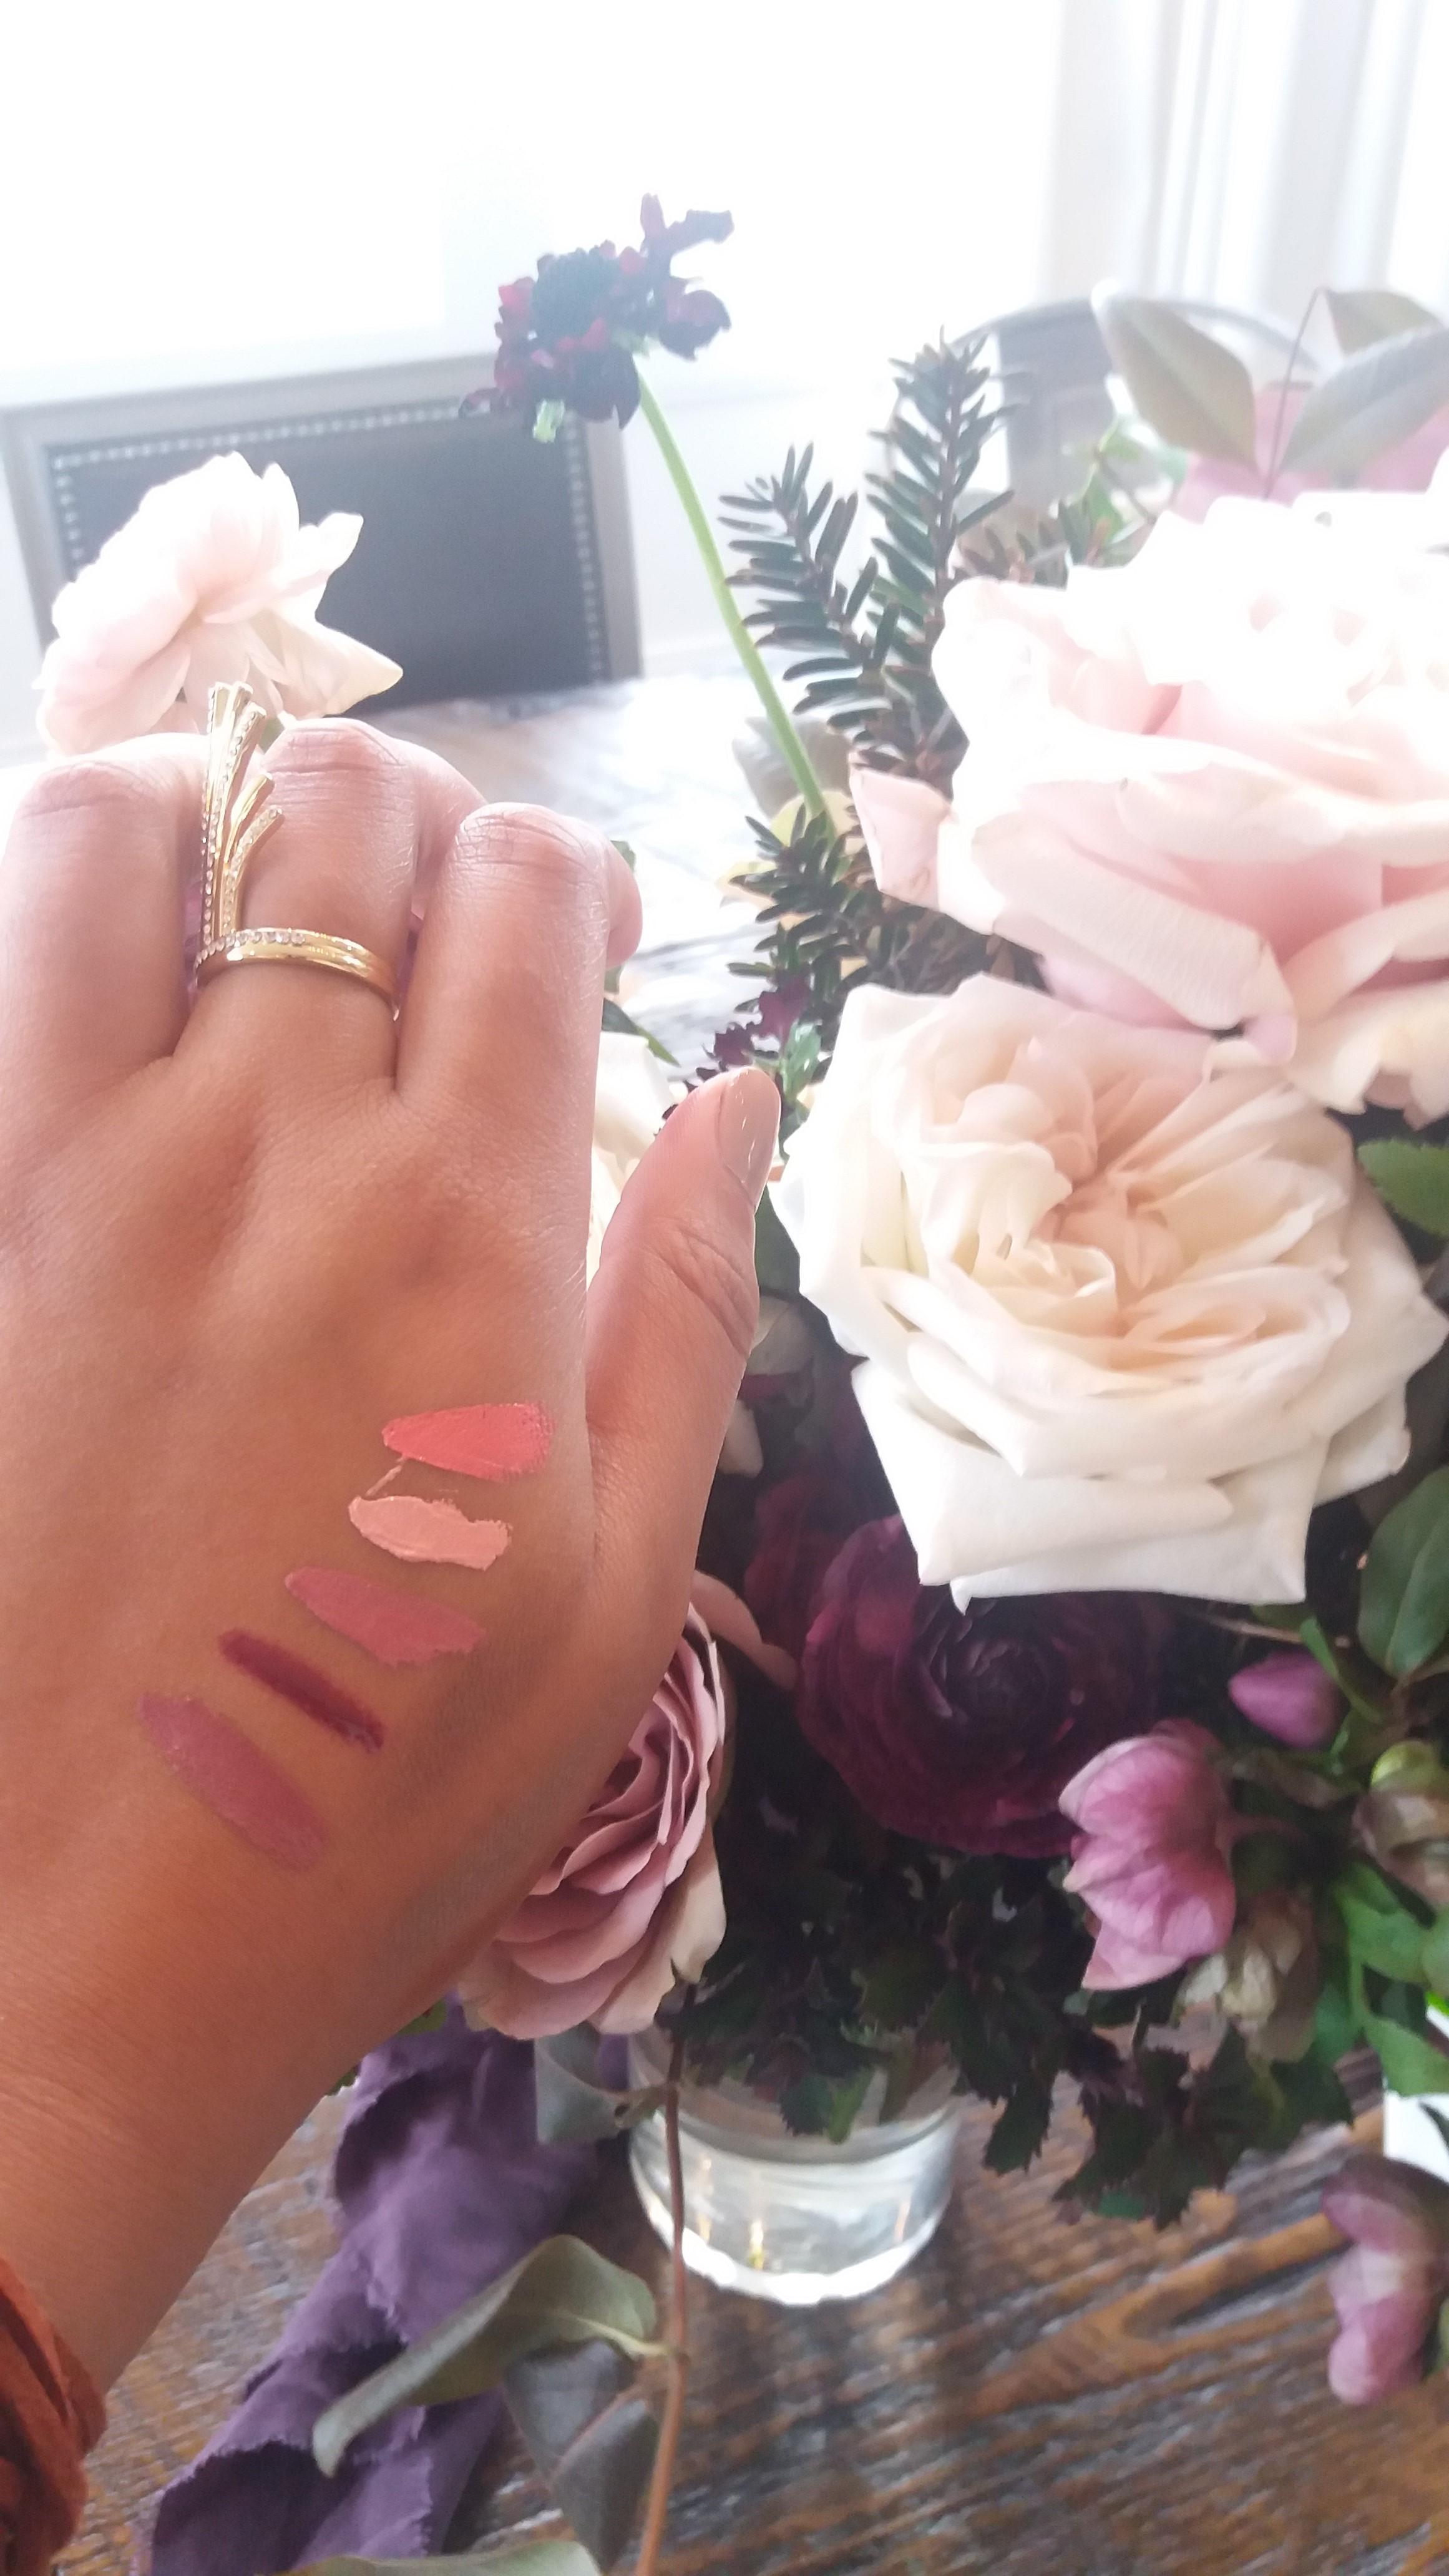 Kentucky Bride Magazine behind the scenes with makeup artist Kana Brown